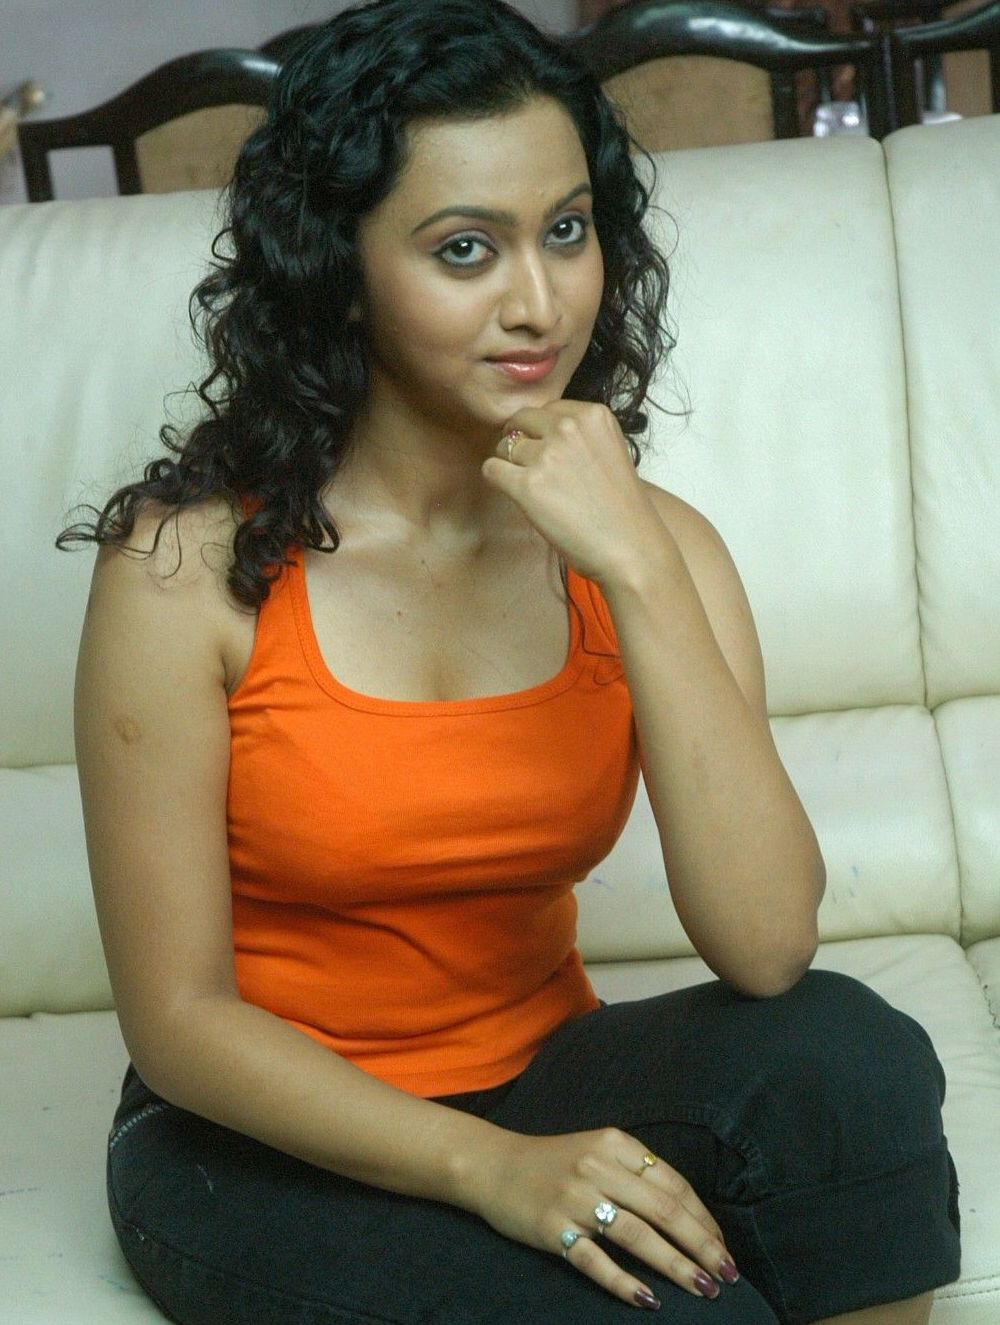 Aakarsha%2BUnseen%2BPhoto%2Bshoot%2Bstills%2B(14) Tamil Actress Ranjitha Photo Gallery. Tuesday, April 12, 2011